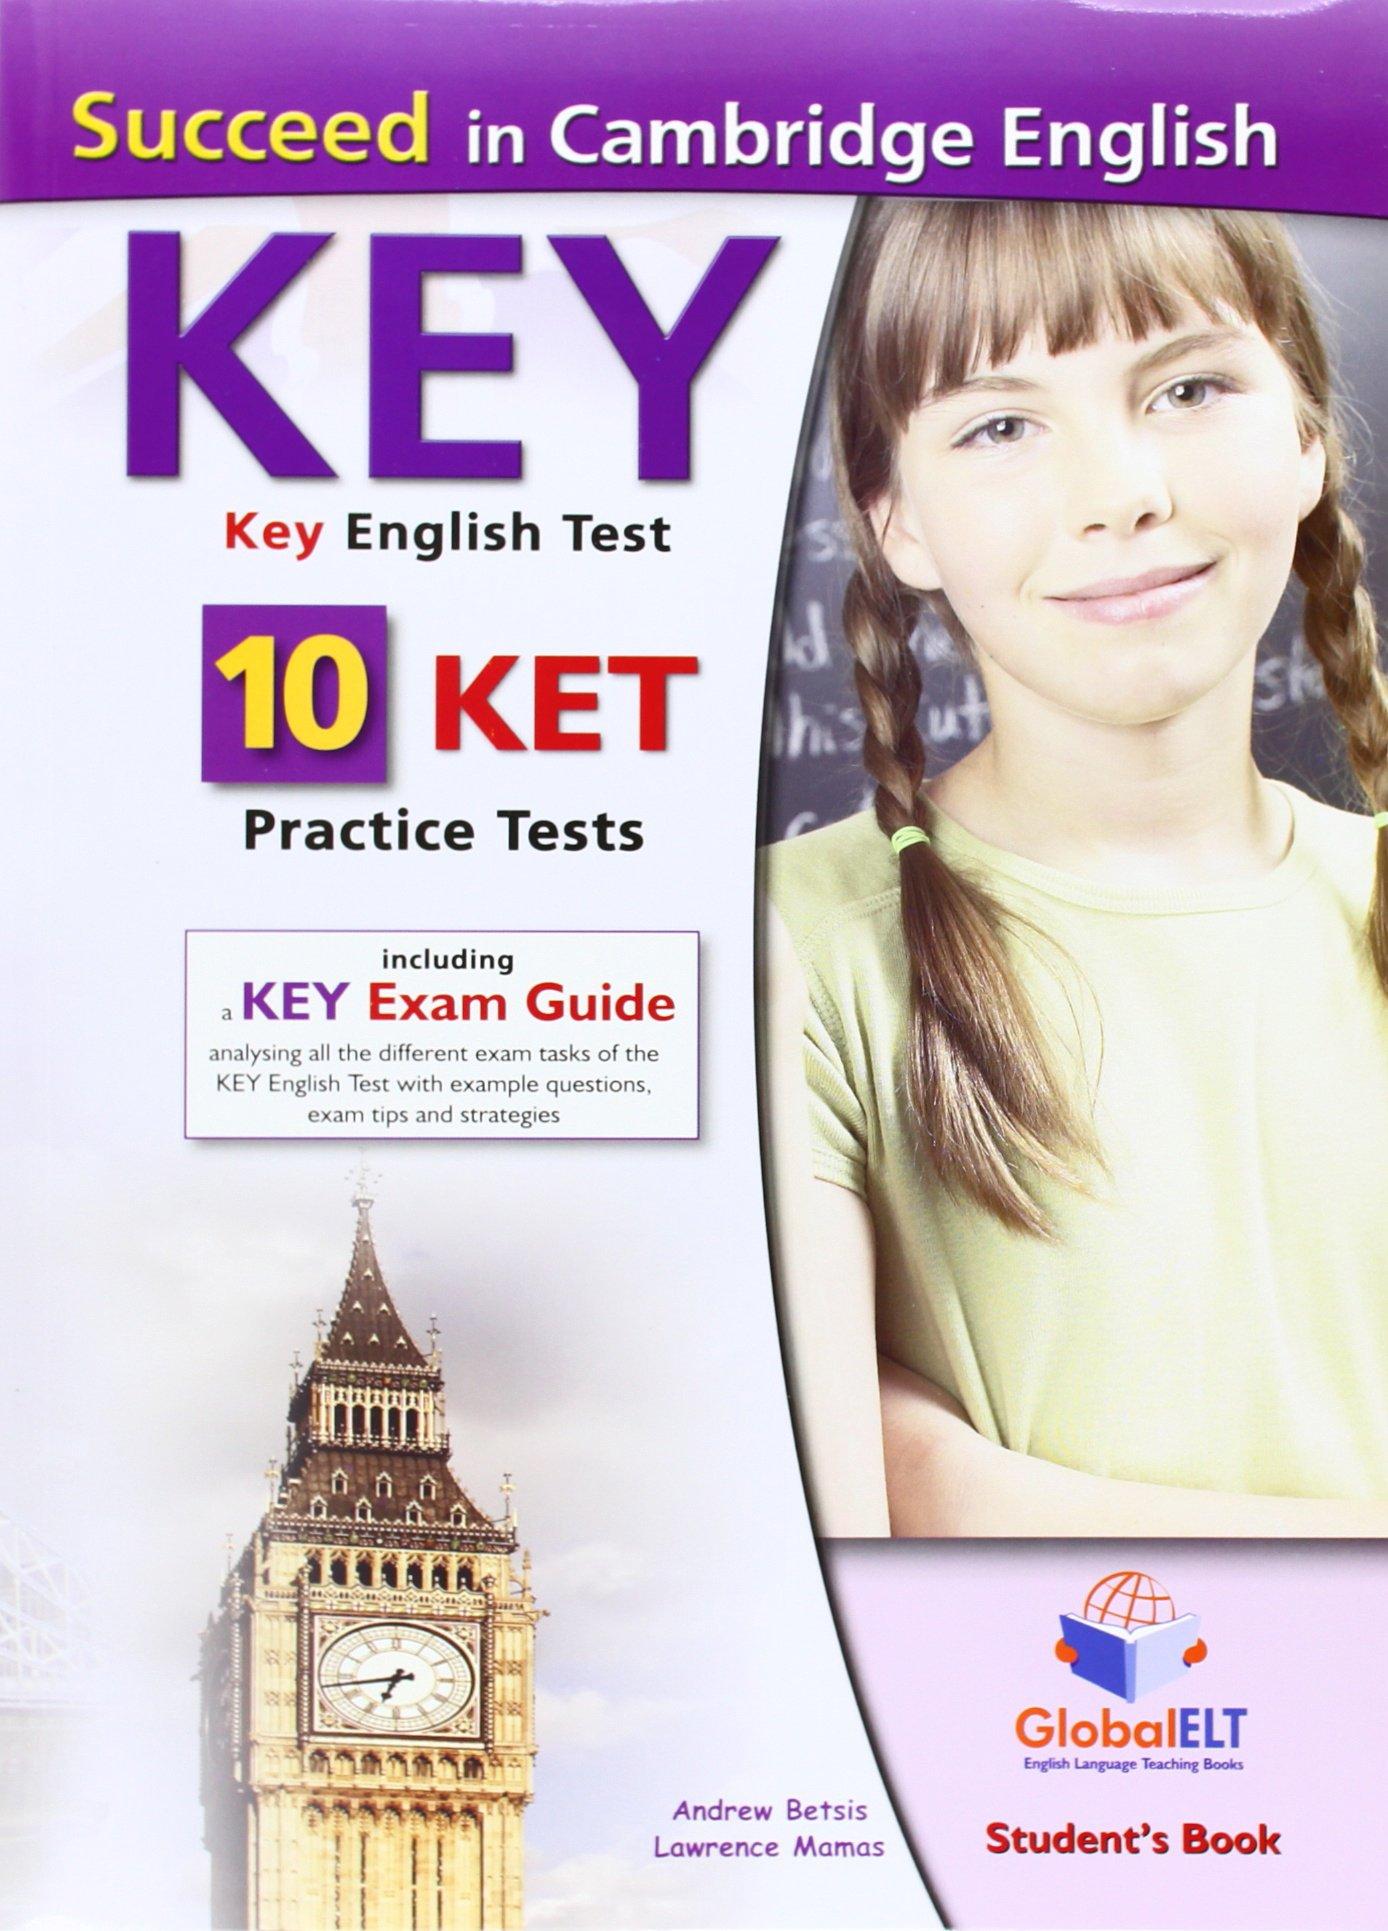 Succeed in Cambridge English Key-ket, Self Study Edition: 10